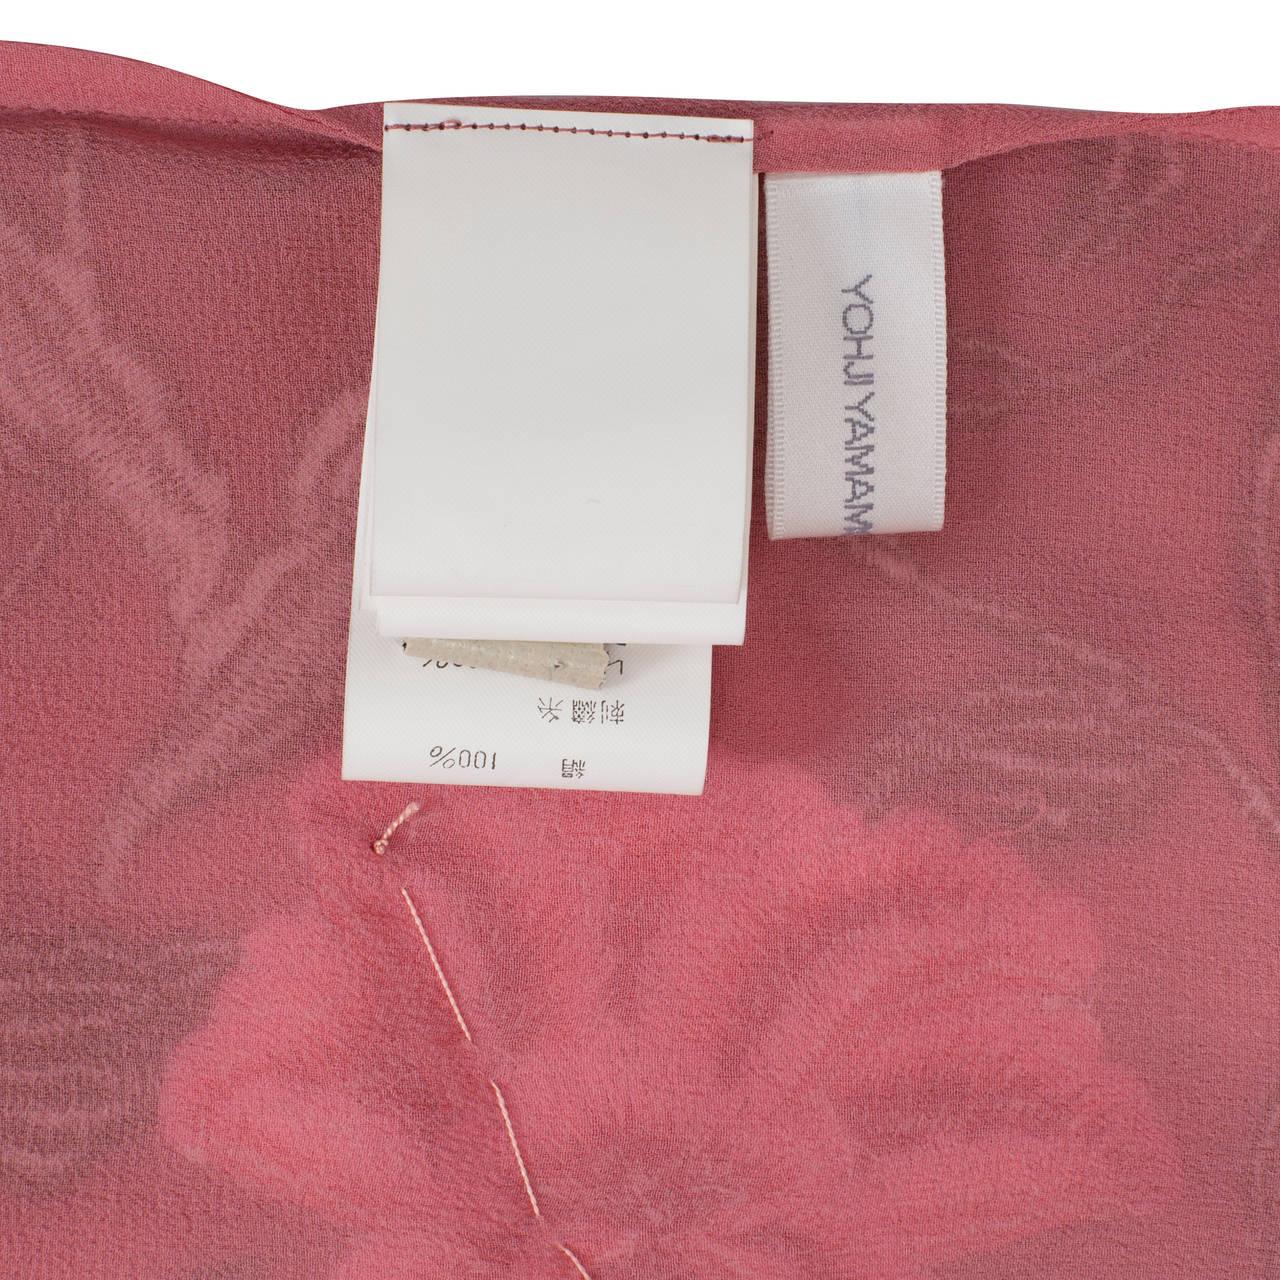 Yohji Yamamoto + Noir Pink Skirt Flower Embroidery For Sale 6